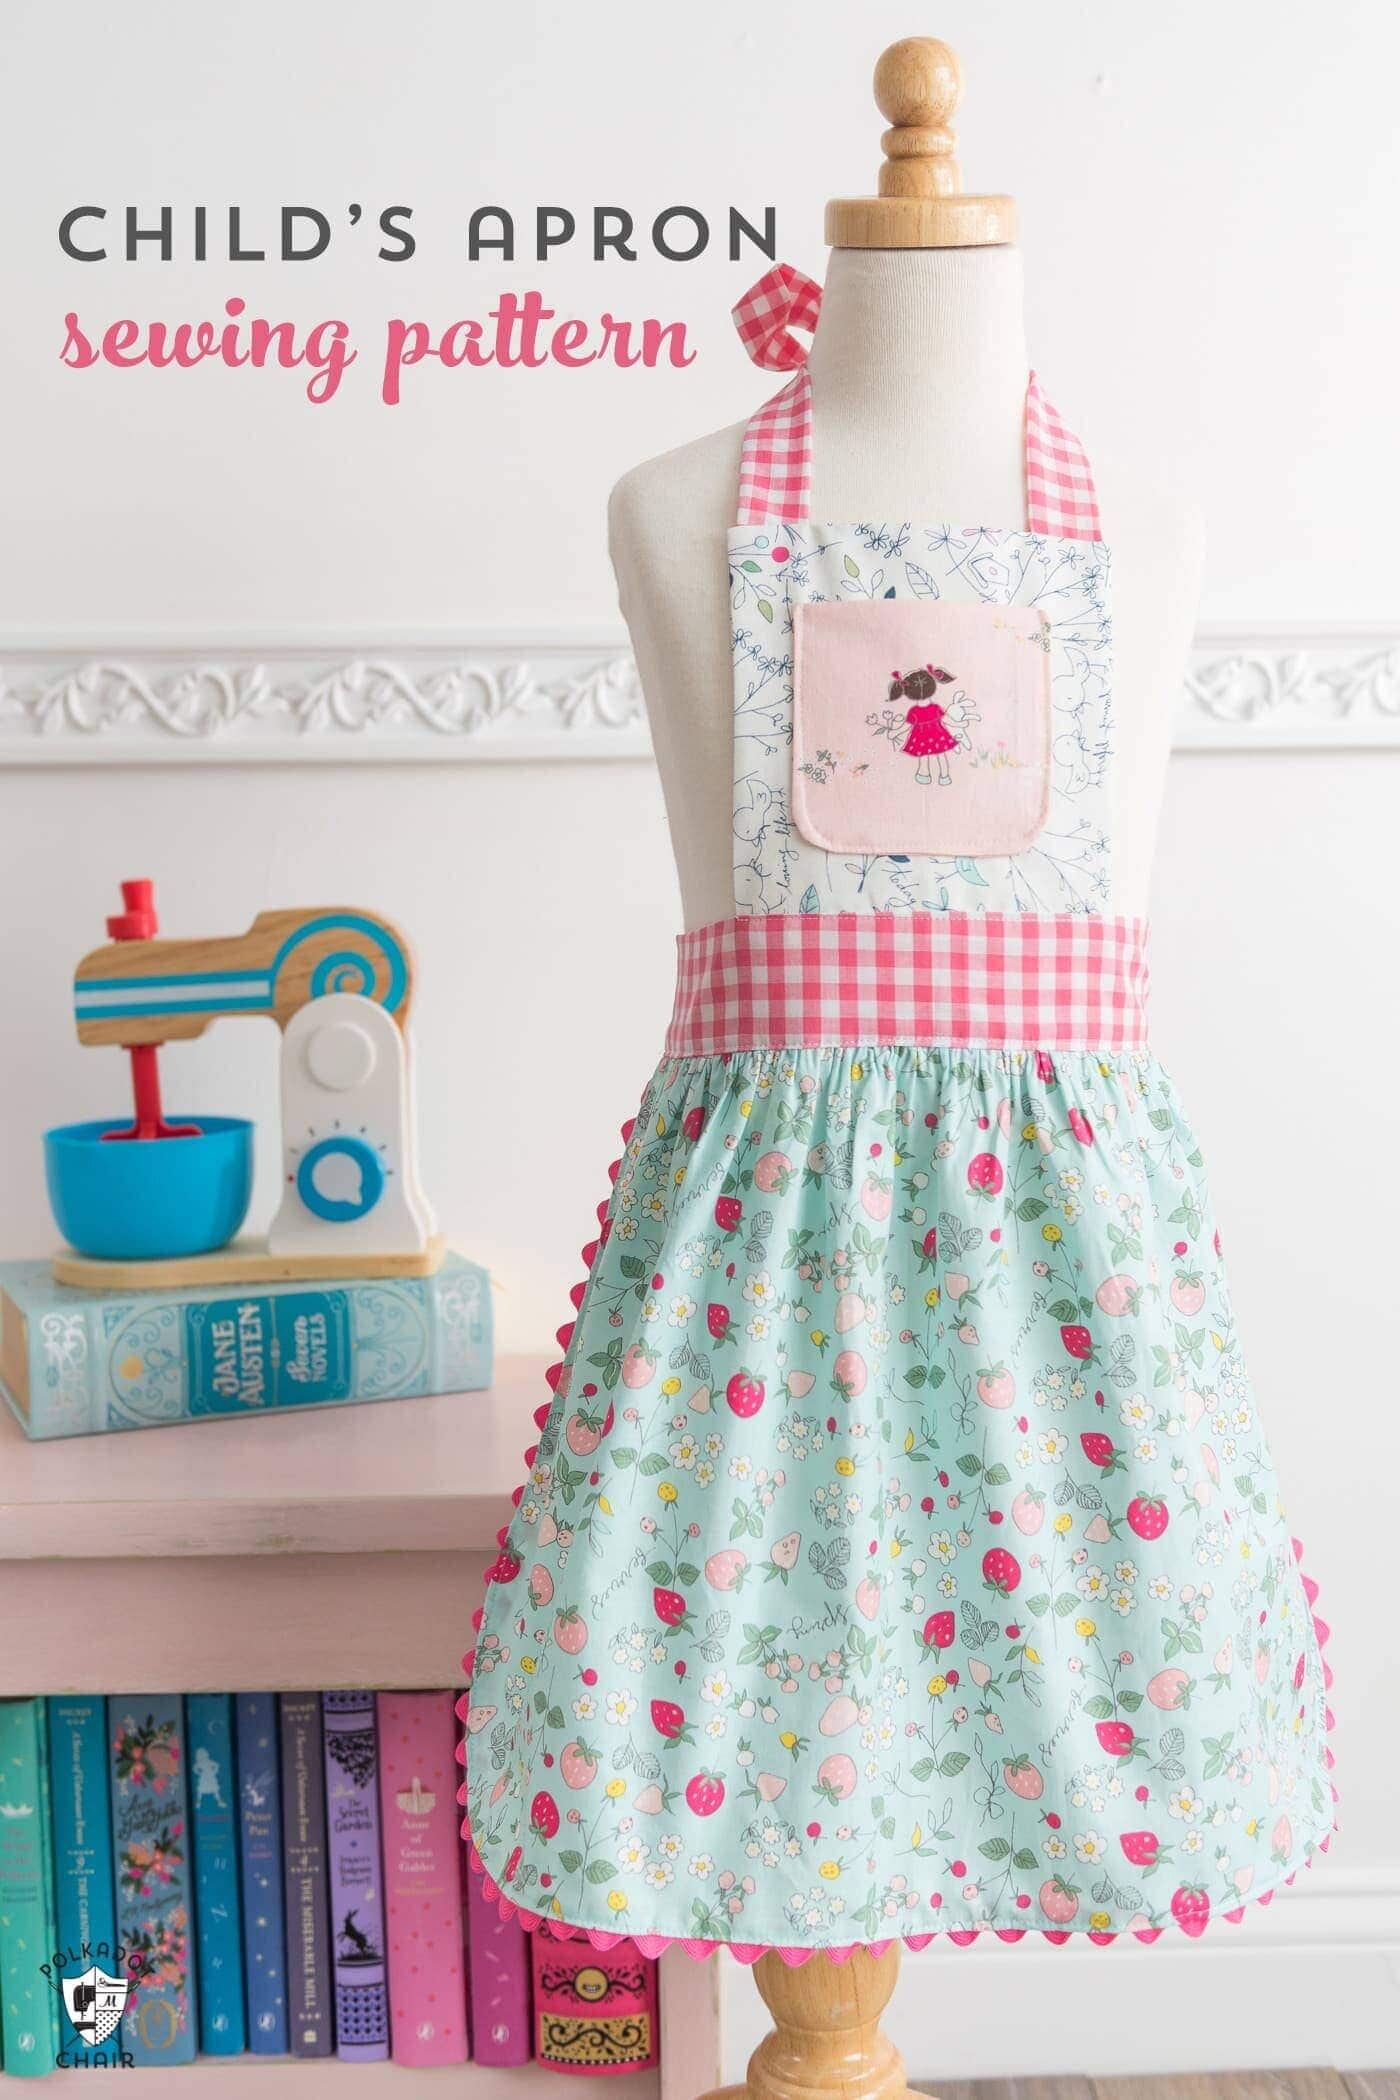 childs-apron-sewing-pattern-2.jpg